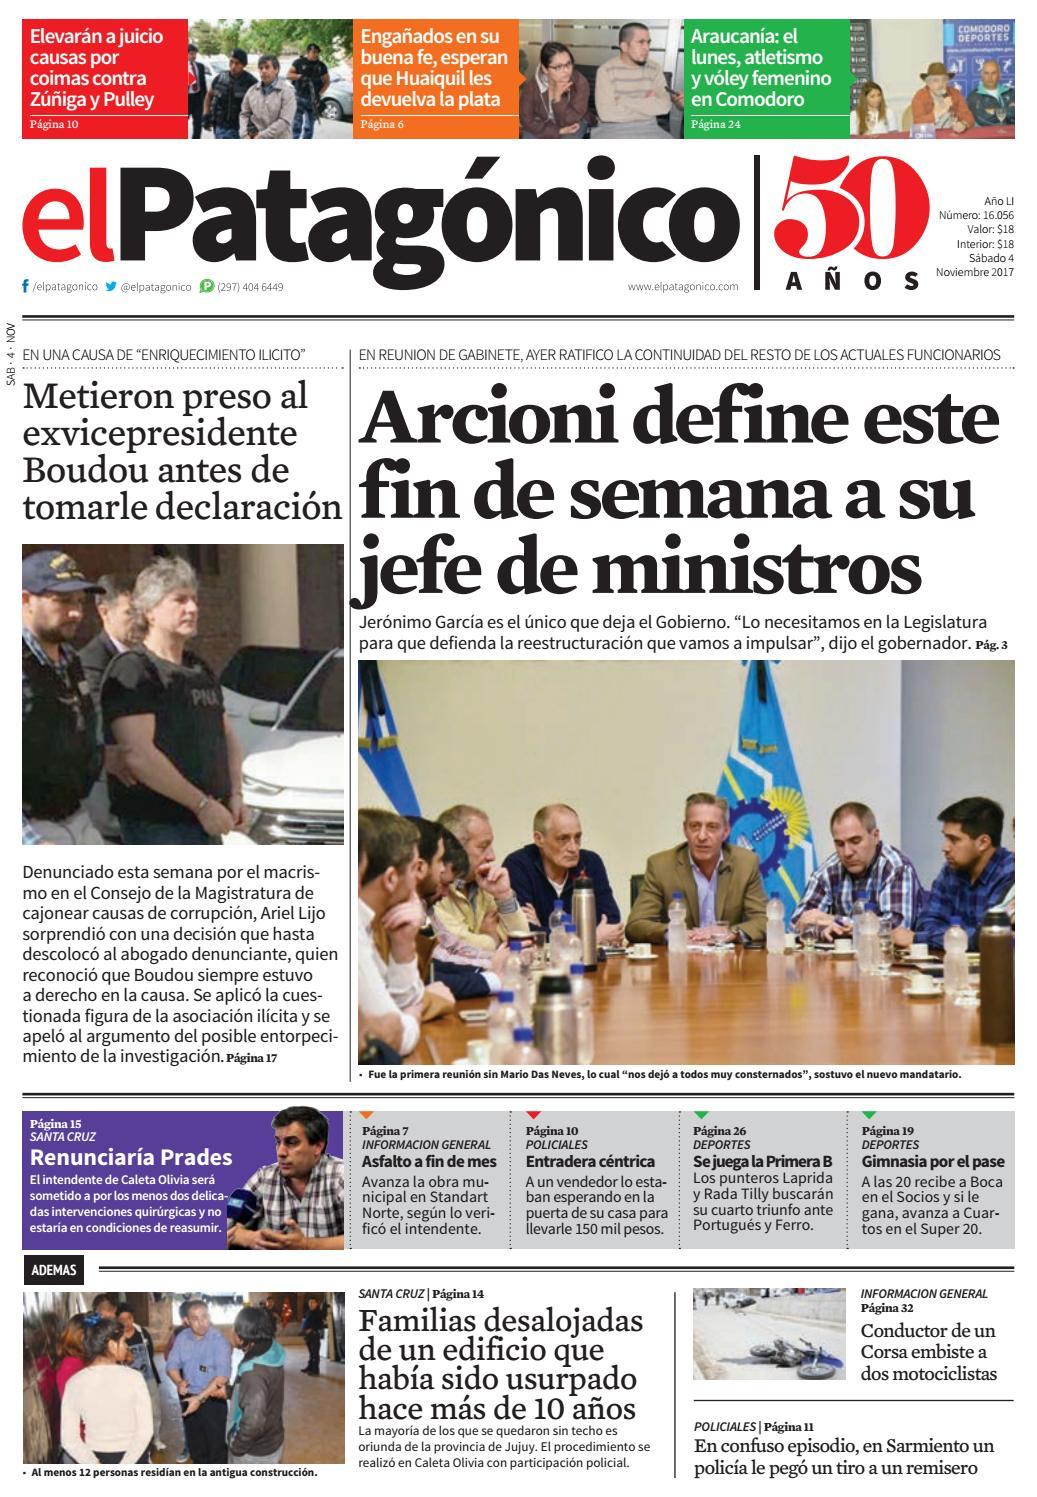 edicion224303112017.pdf by El Patagonico - issuu